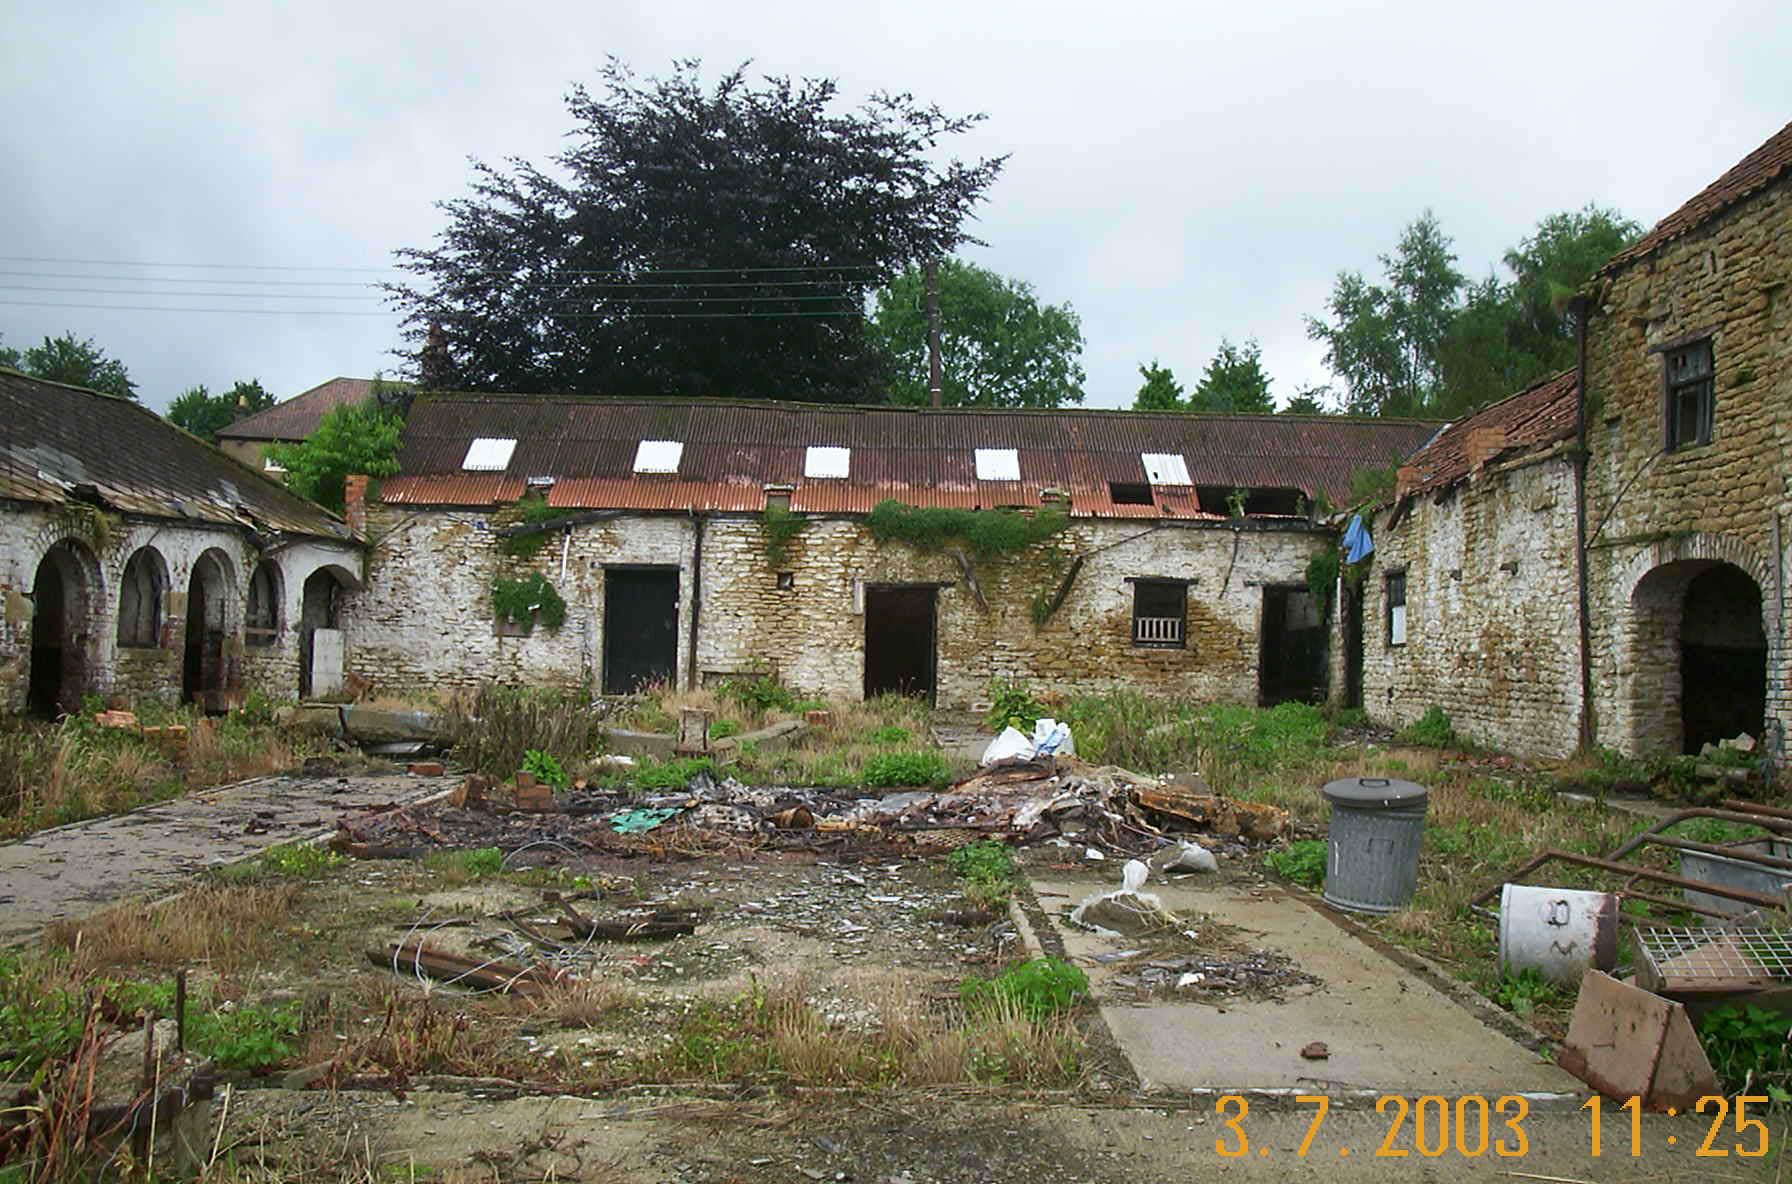 Lora farm buildings 2003